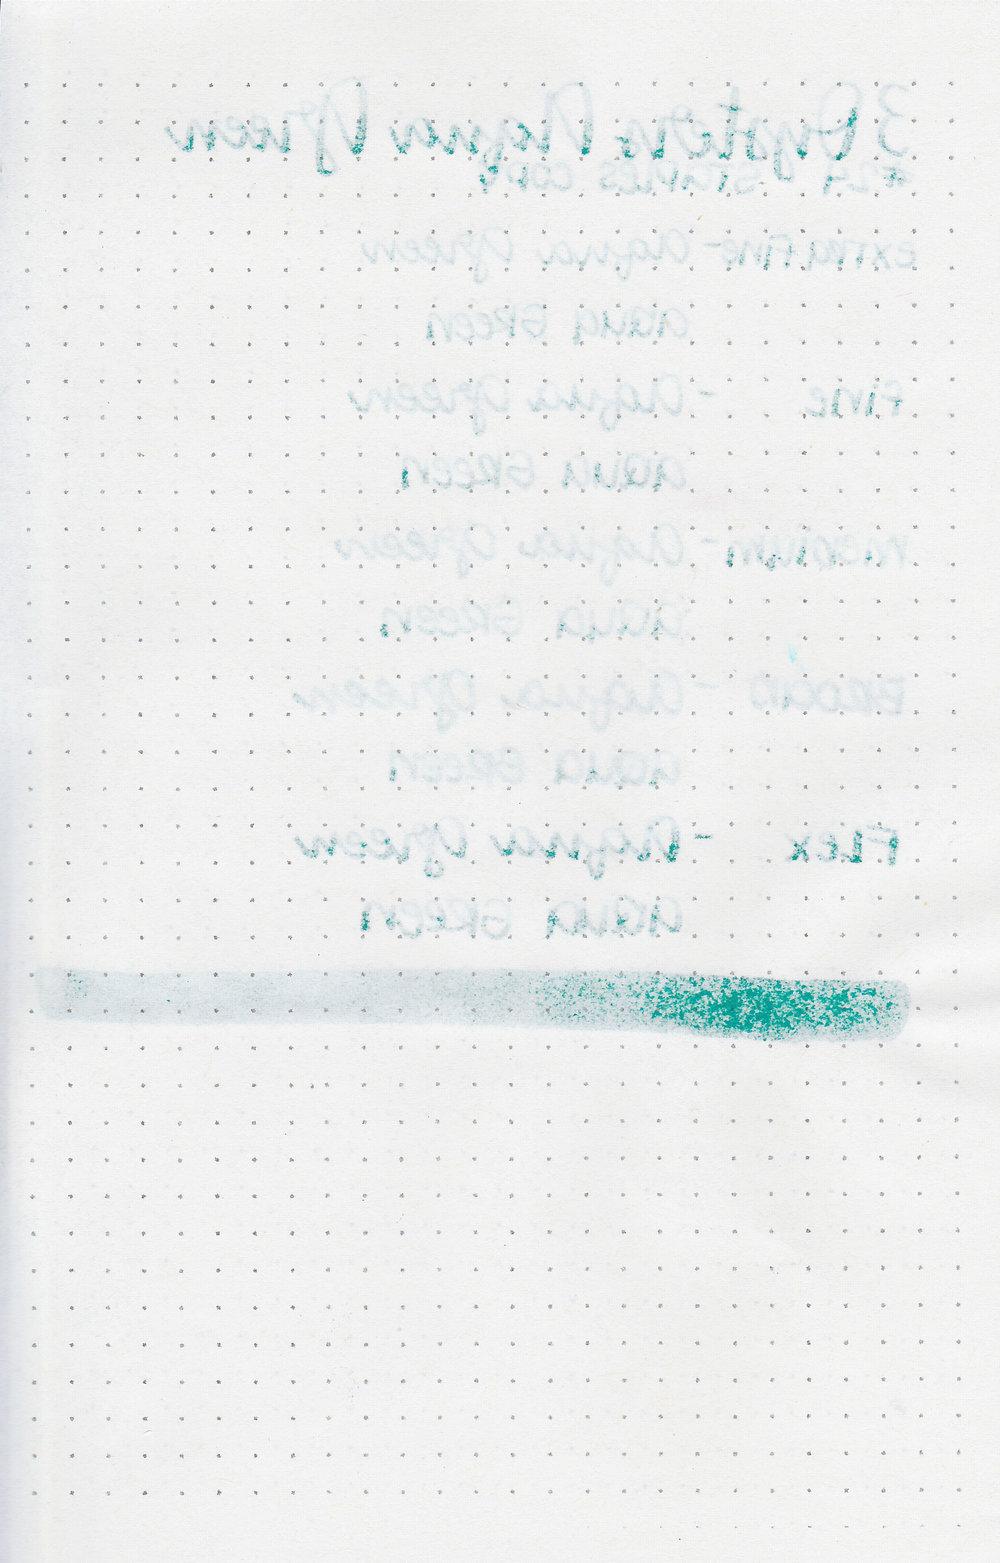 3o-aqua-green-12.jpg